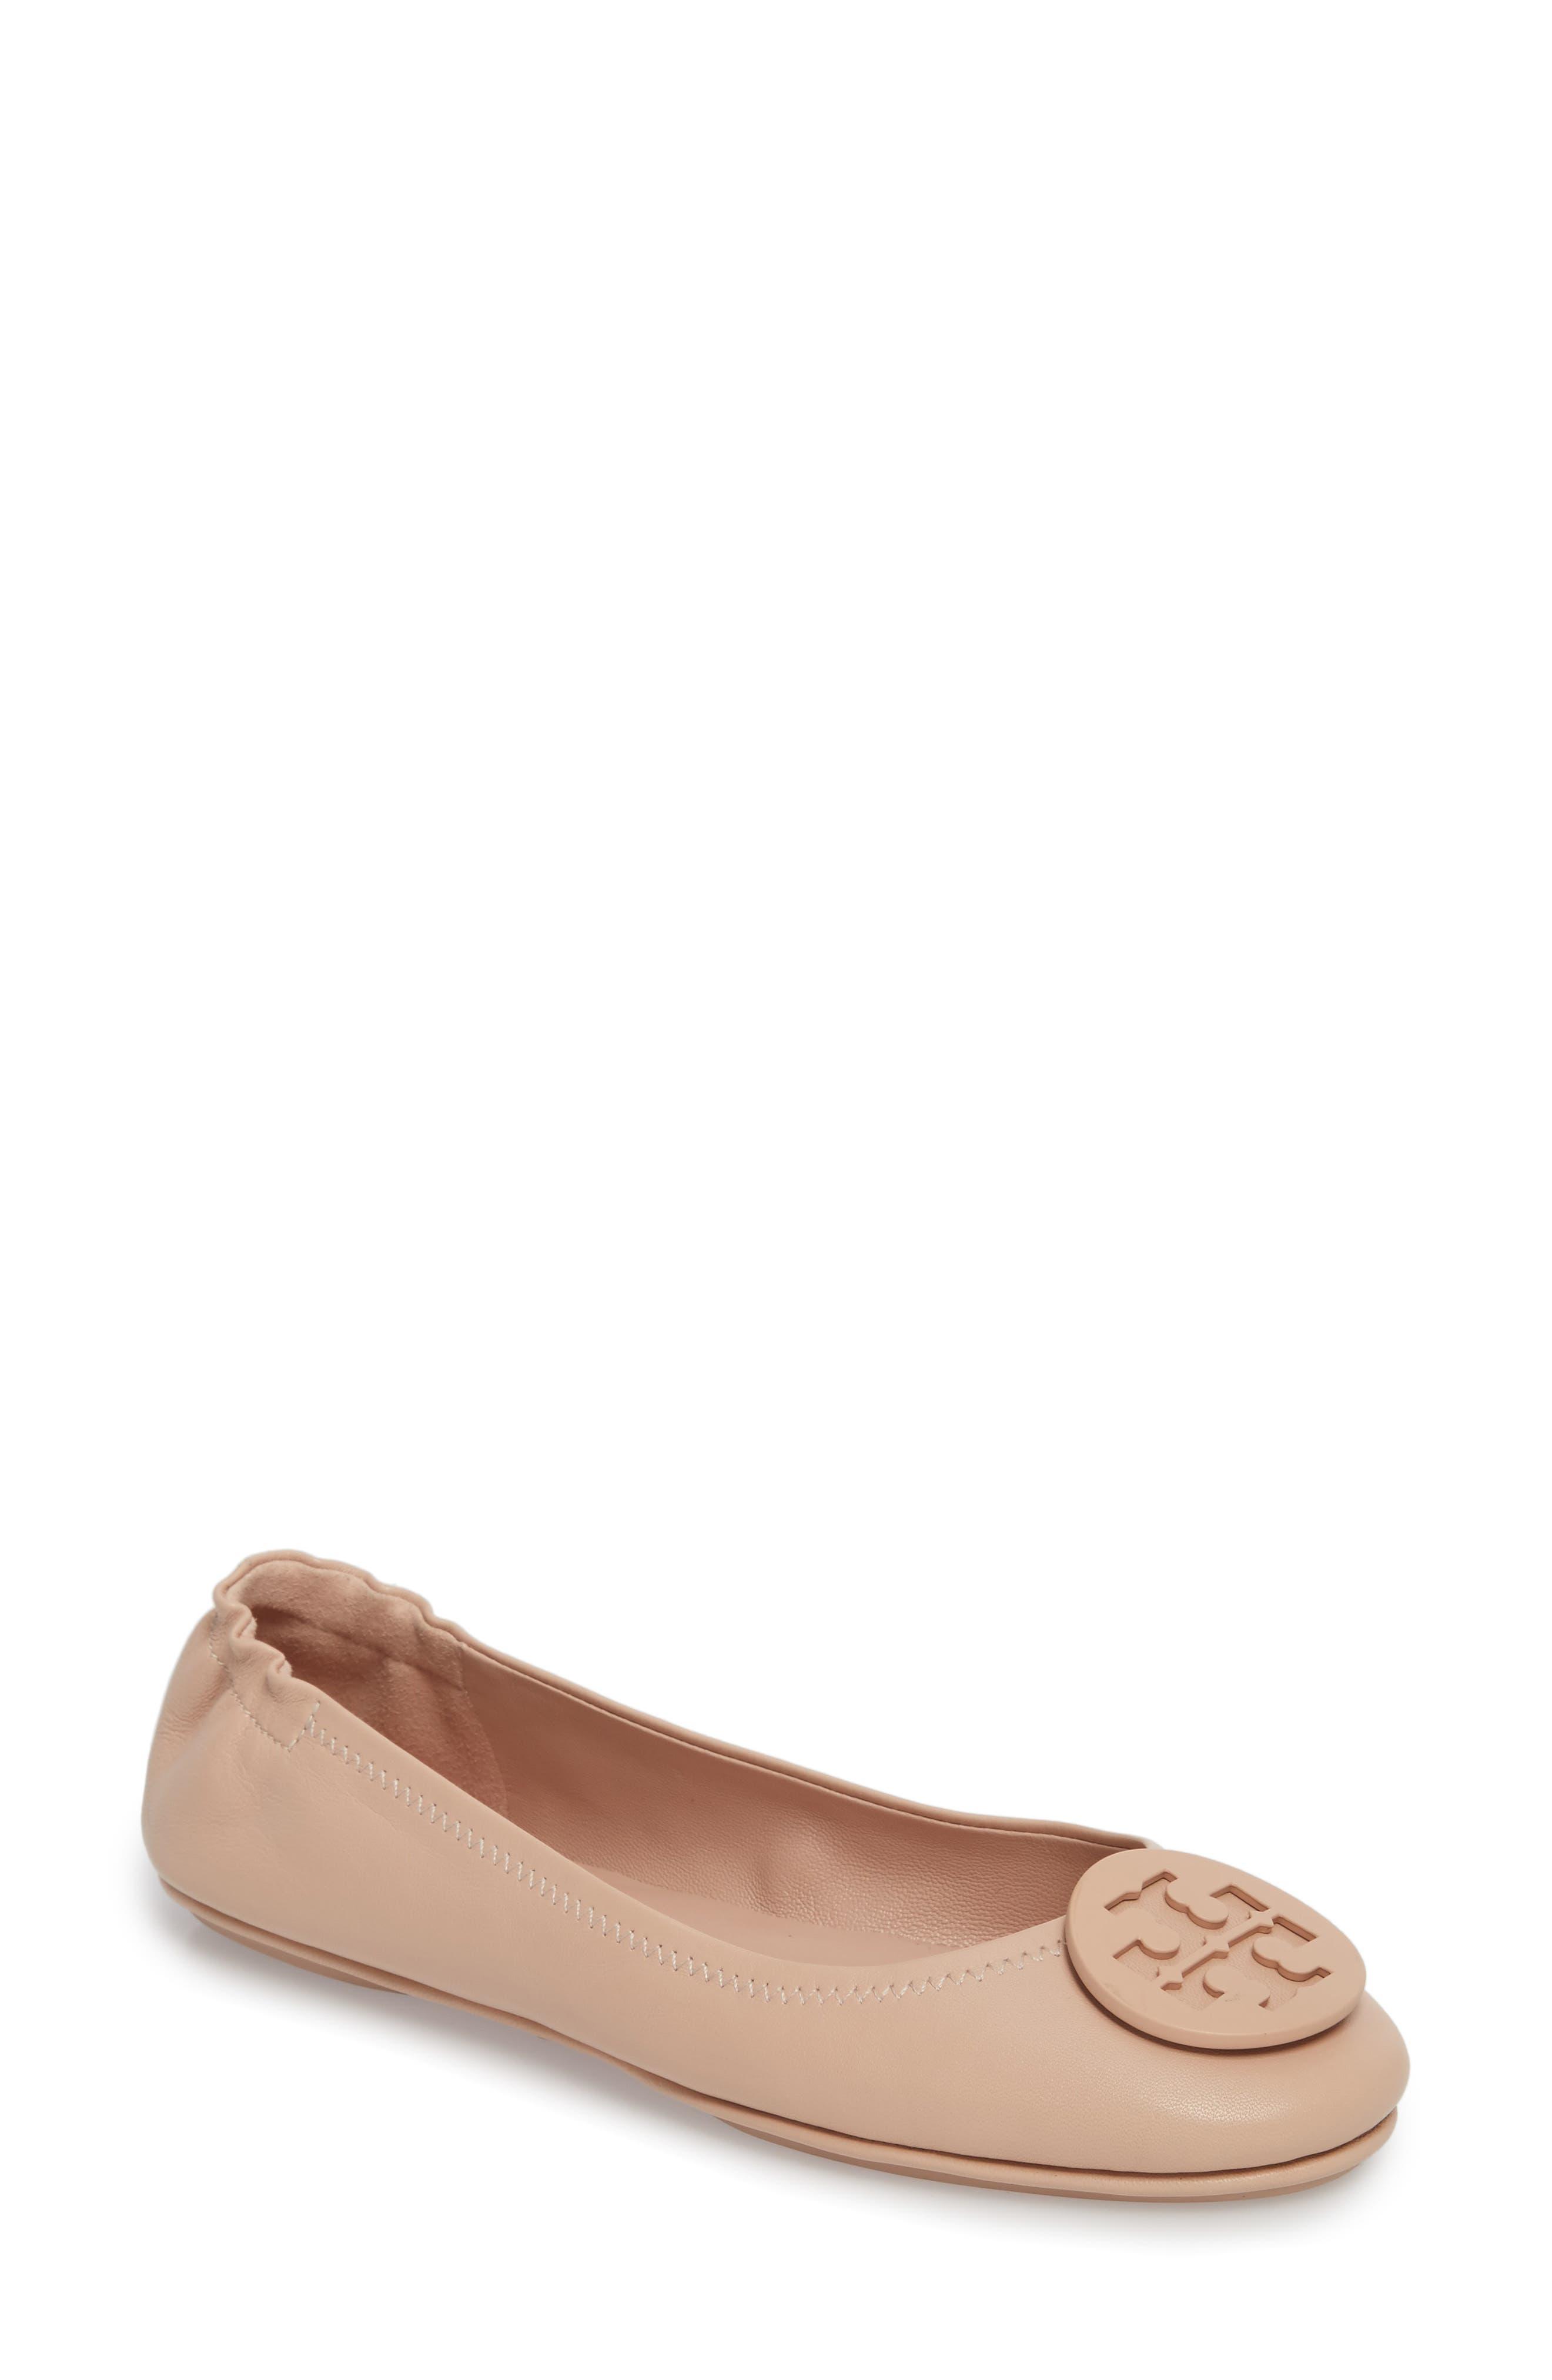 Main Image - Tory Burch 'Minnie' Travel Ballet Flat (Women)